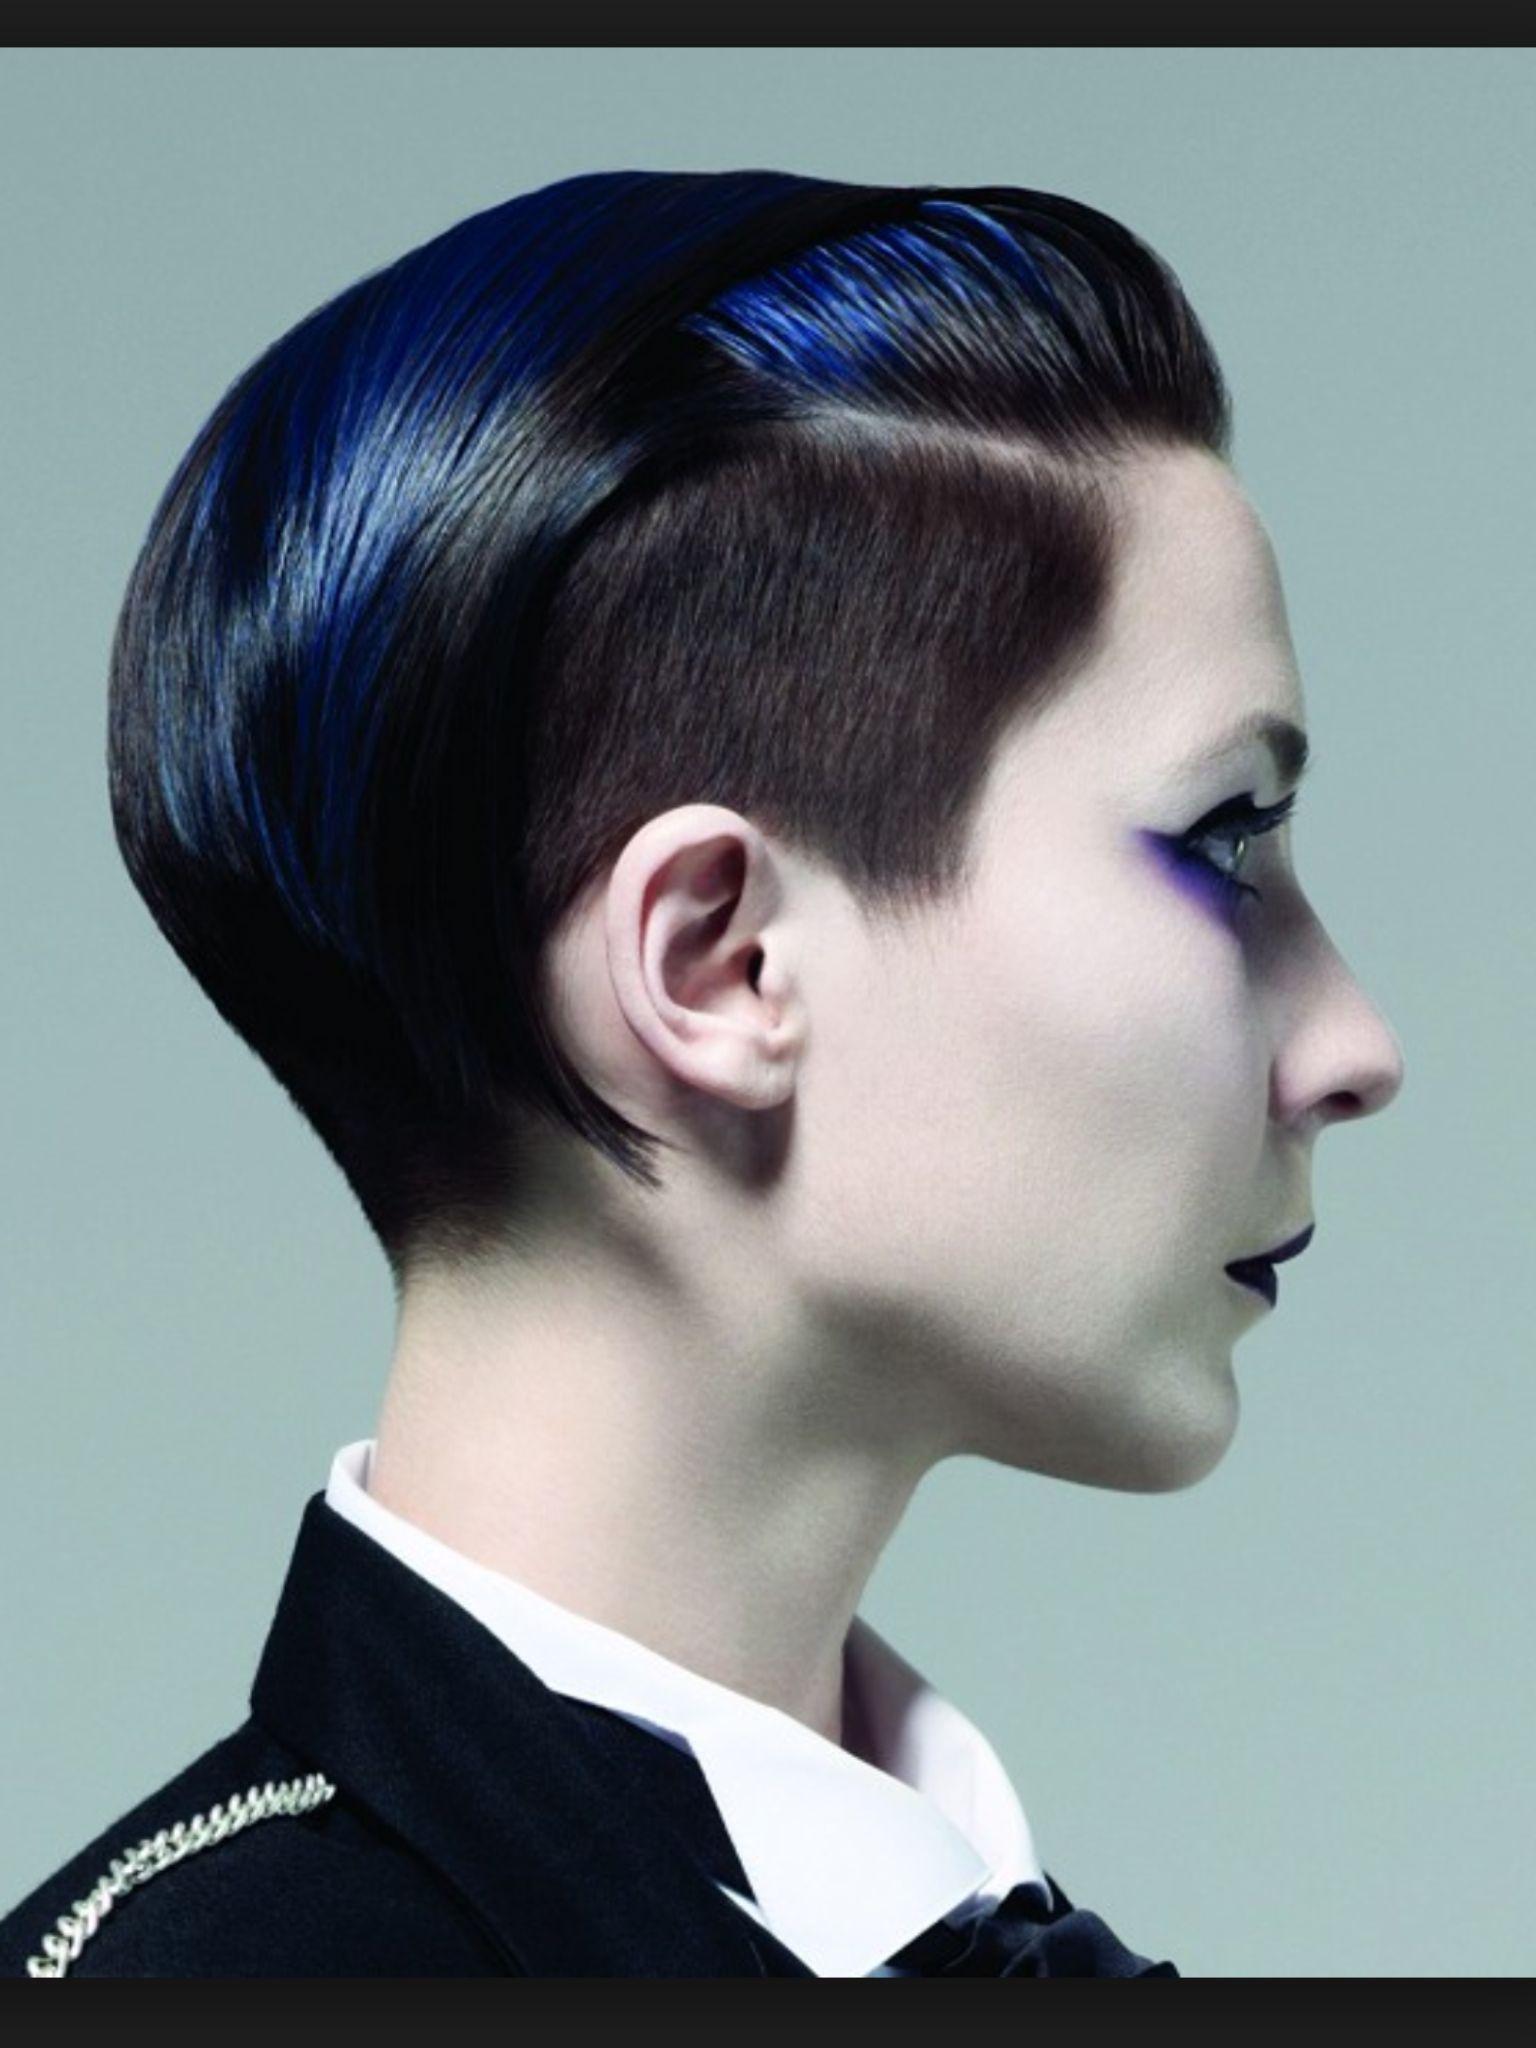 Tapered edgy undercut long fringe | hair cut | Pinterest ...